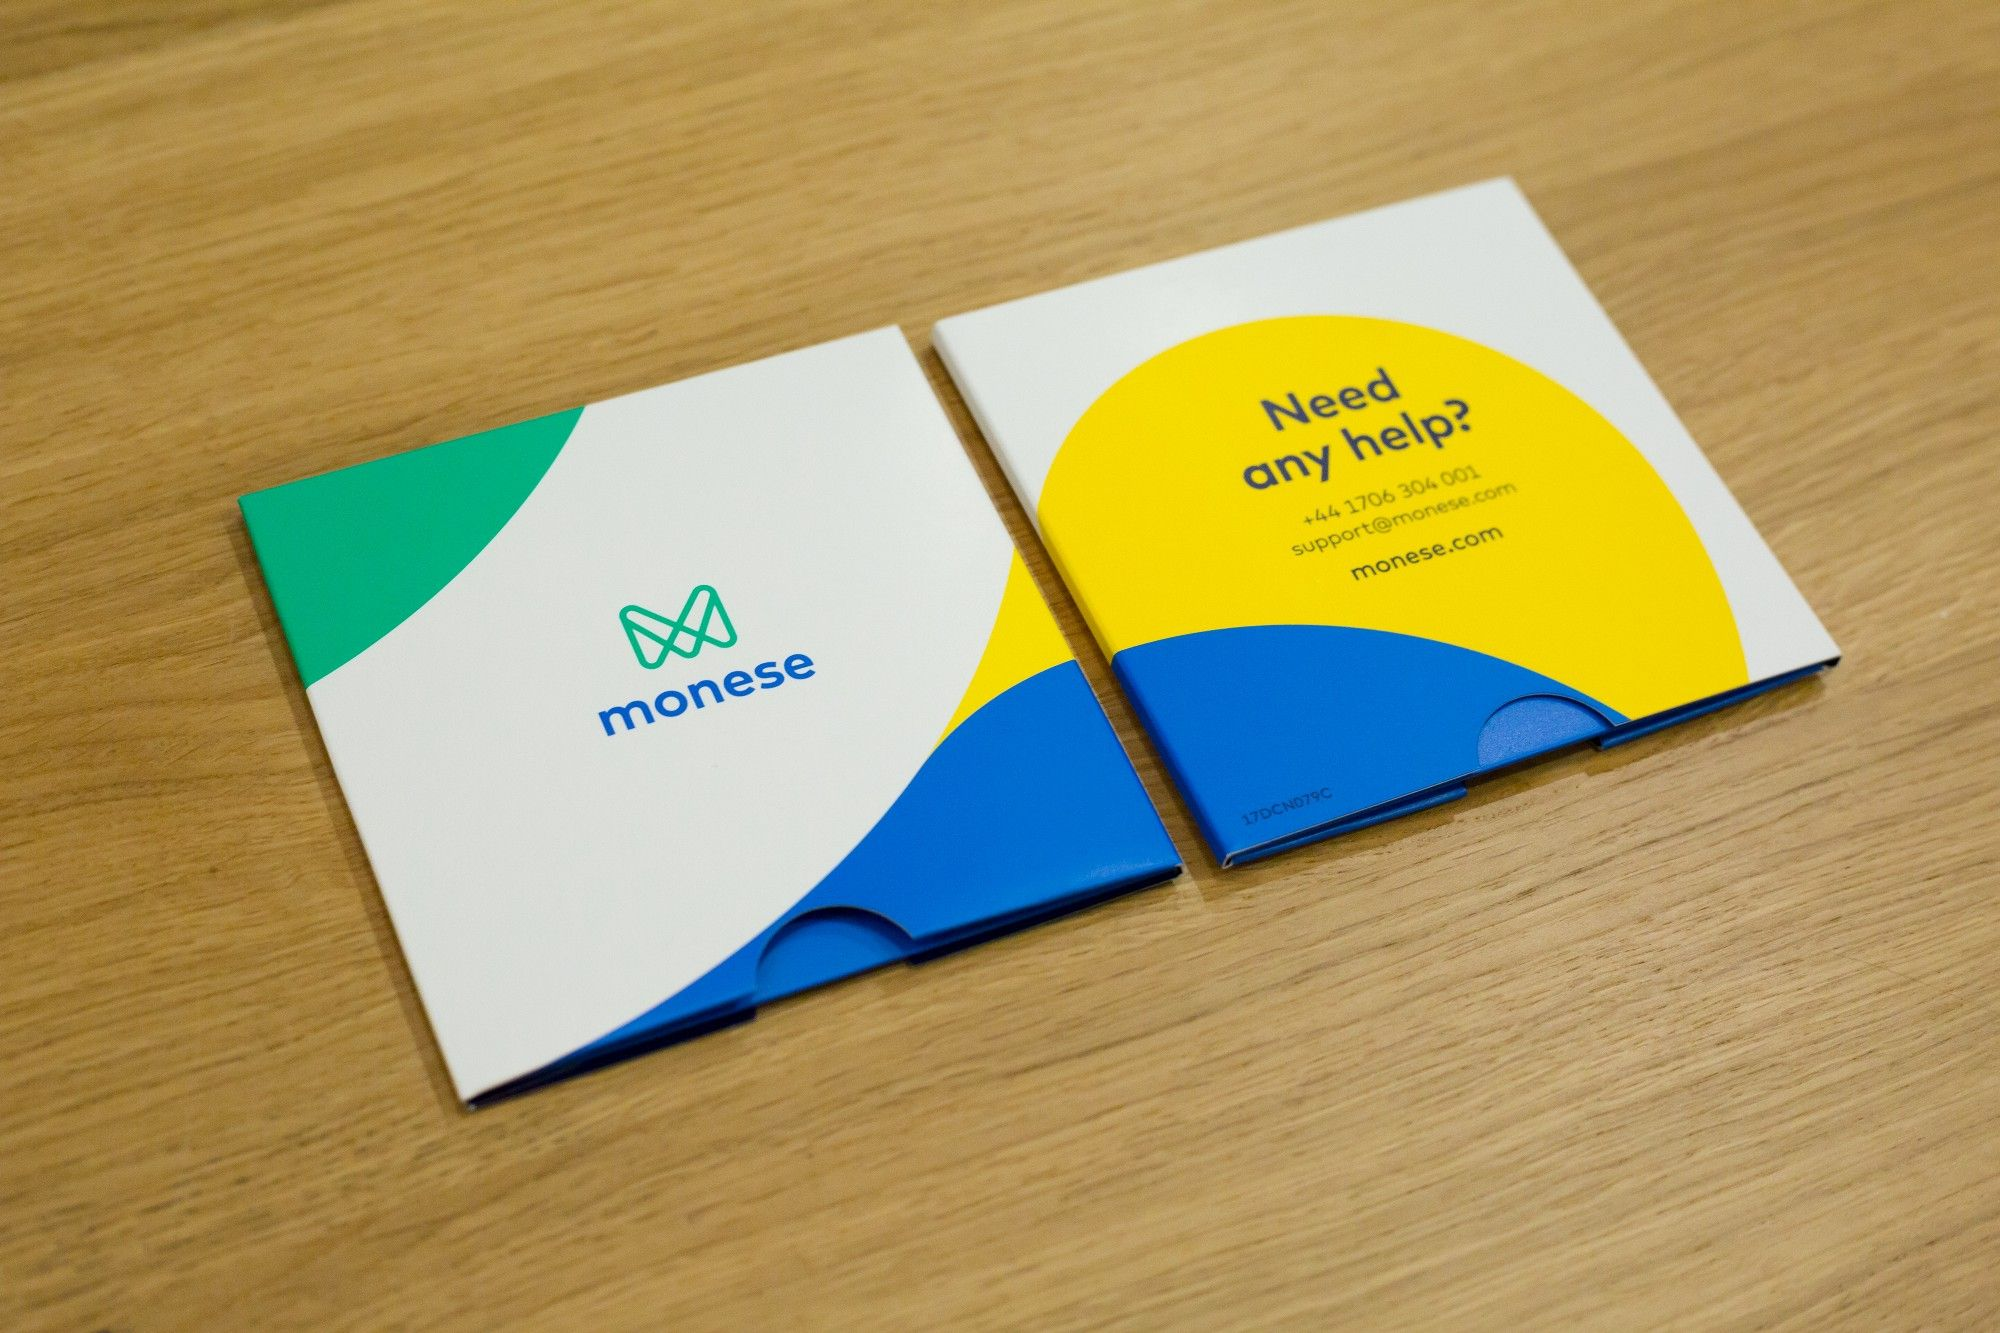 Rebranding A Digital Bank Amazon Credit Card Credit Card Application Credit Card Apply